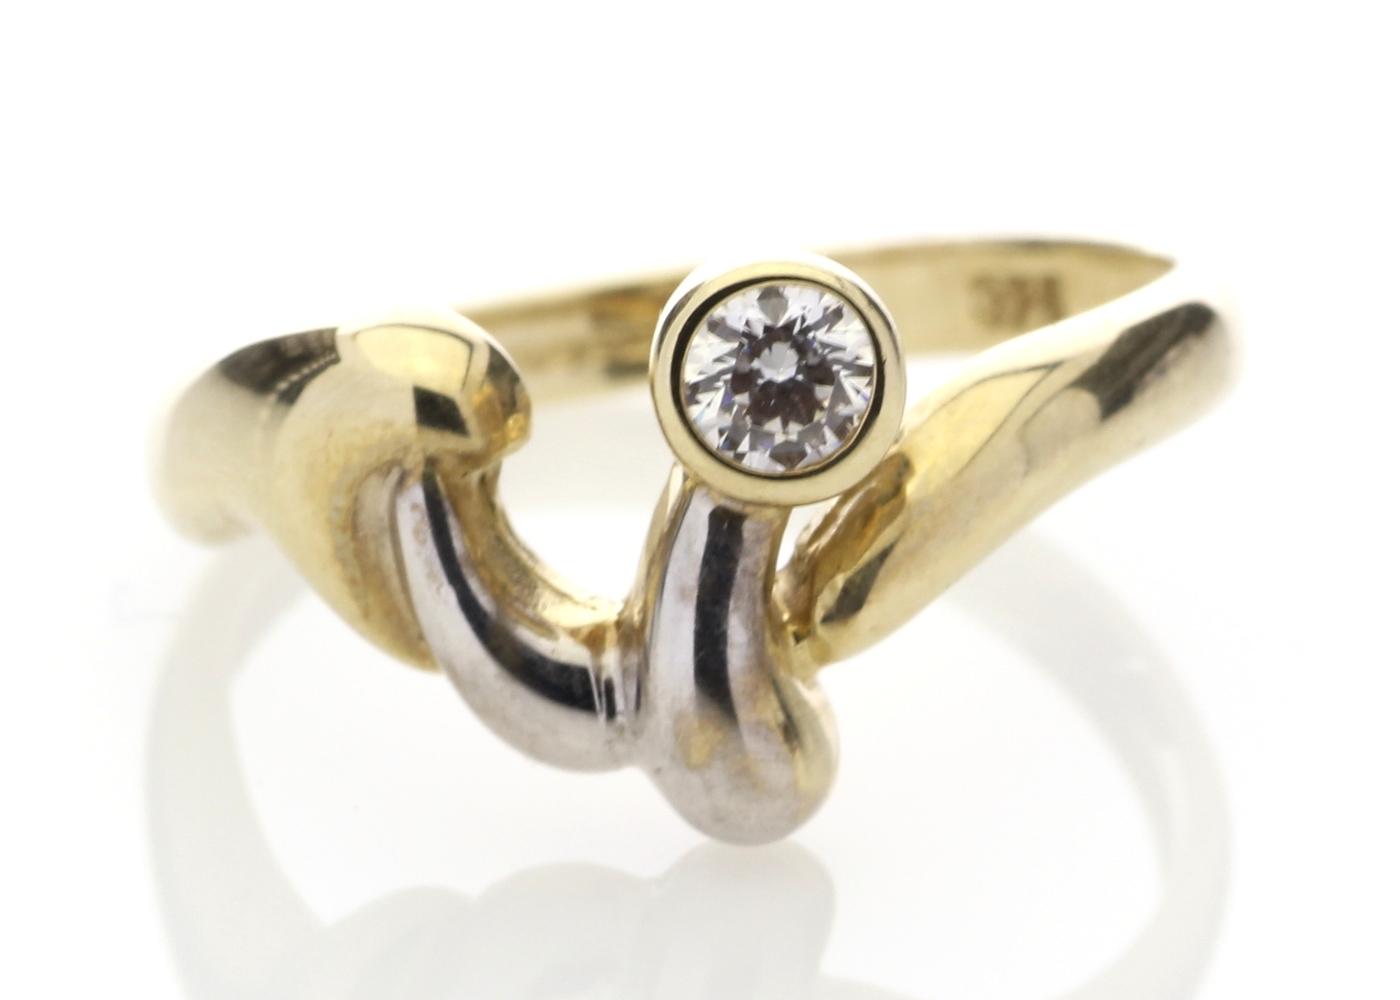 Lot 43 - 9ct Single Stone Rub Over Set Diamond Ring 0.20 Carats